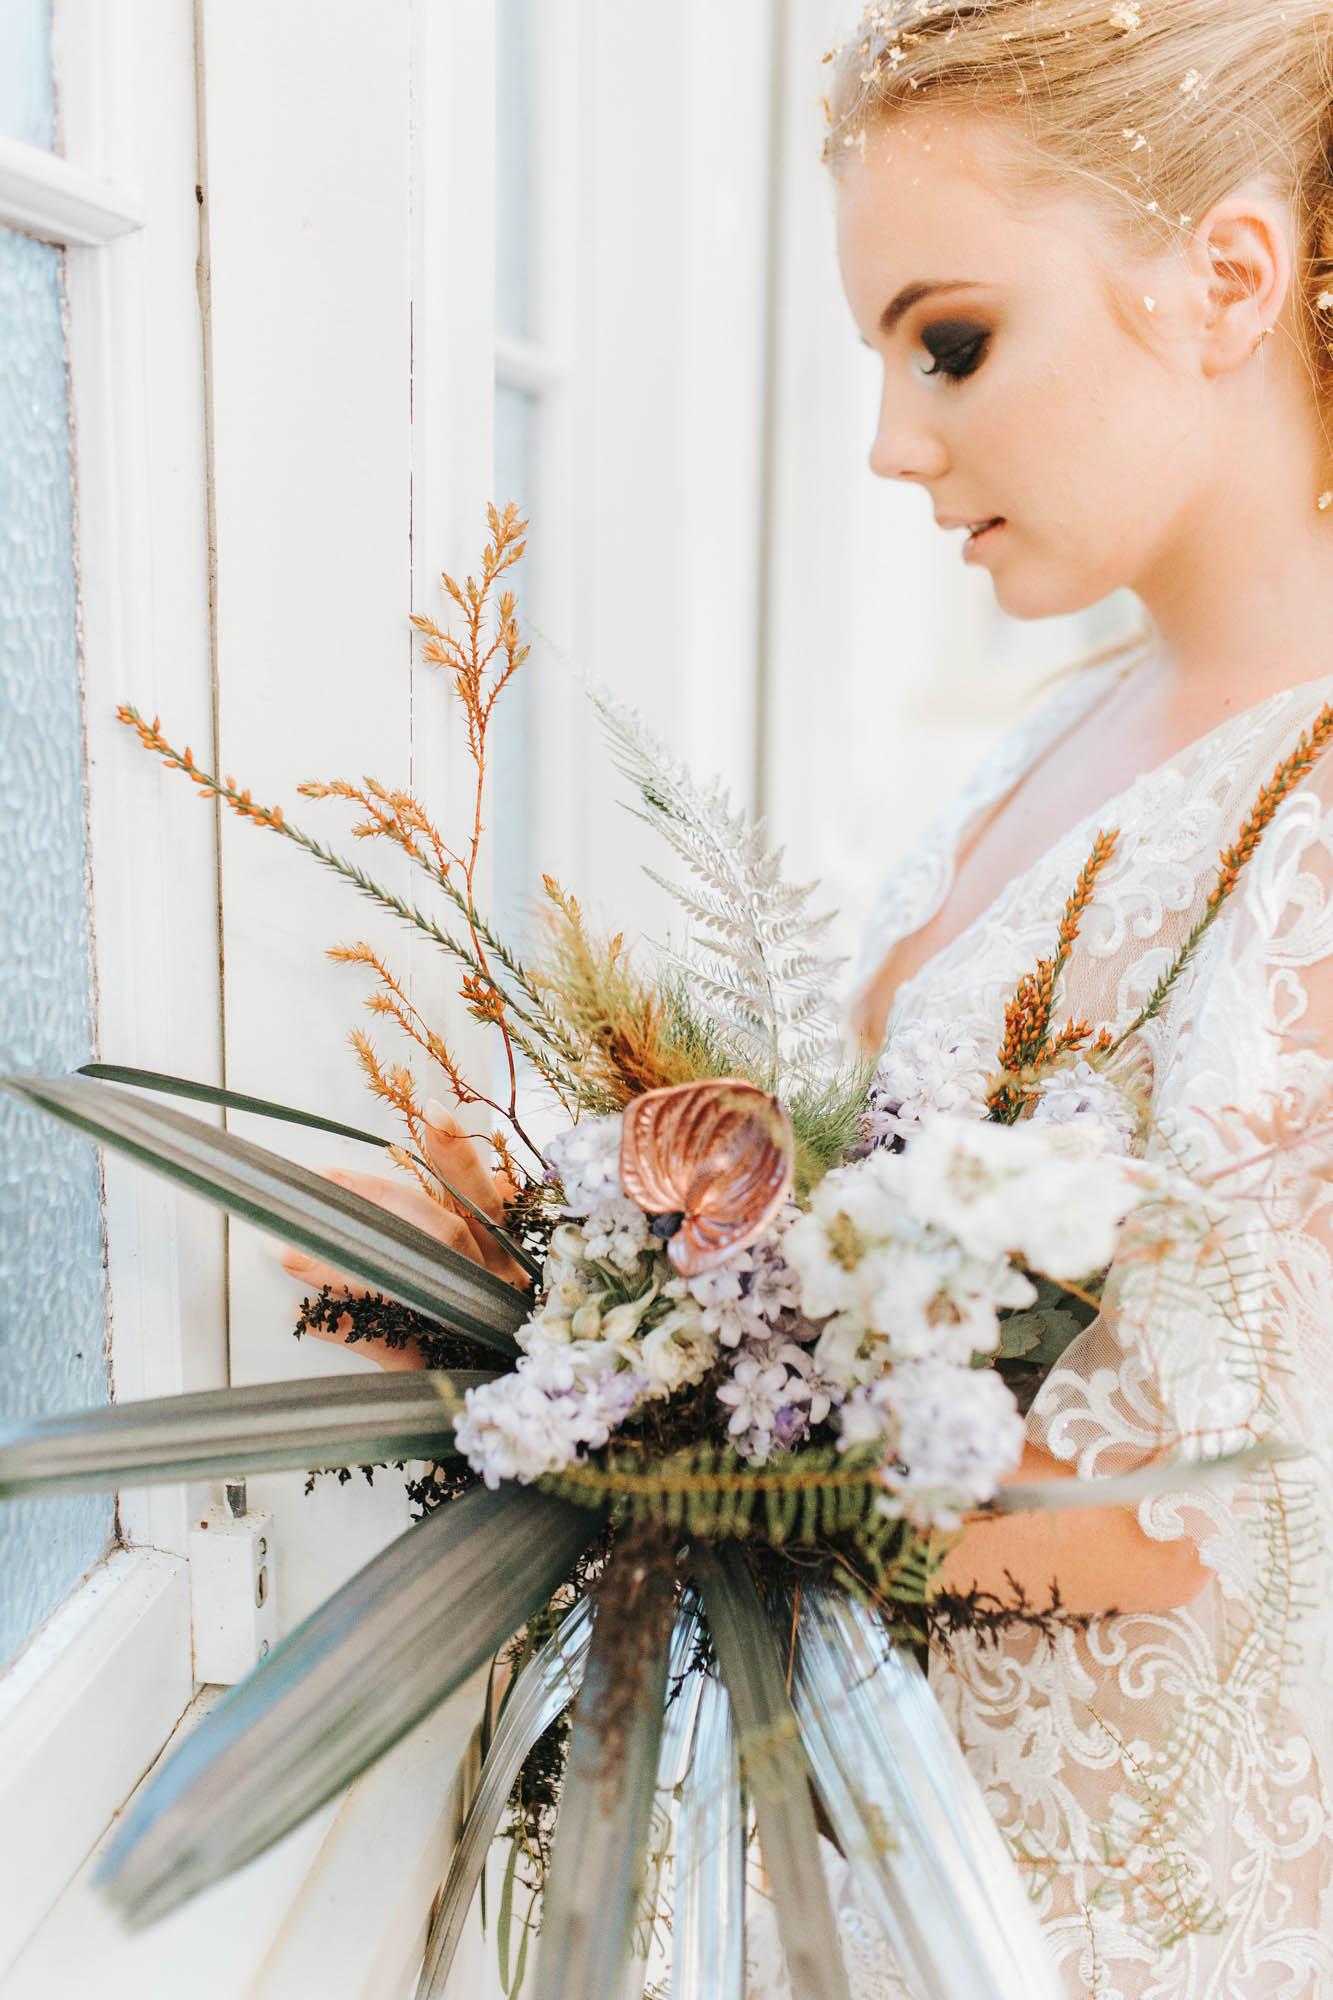 Outworlder - wedding editorial